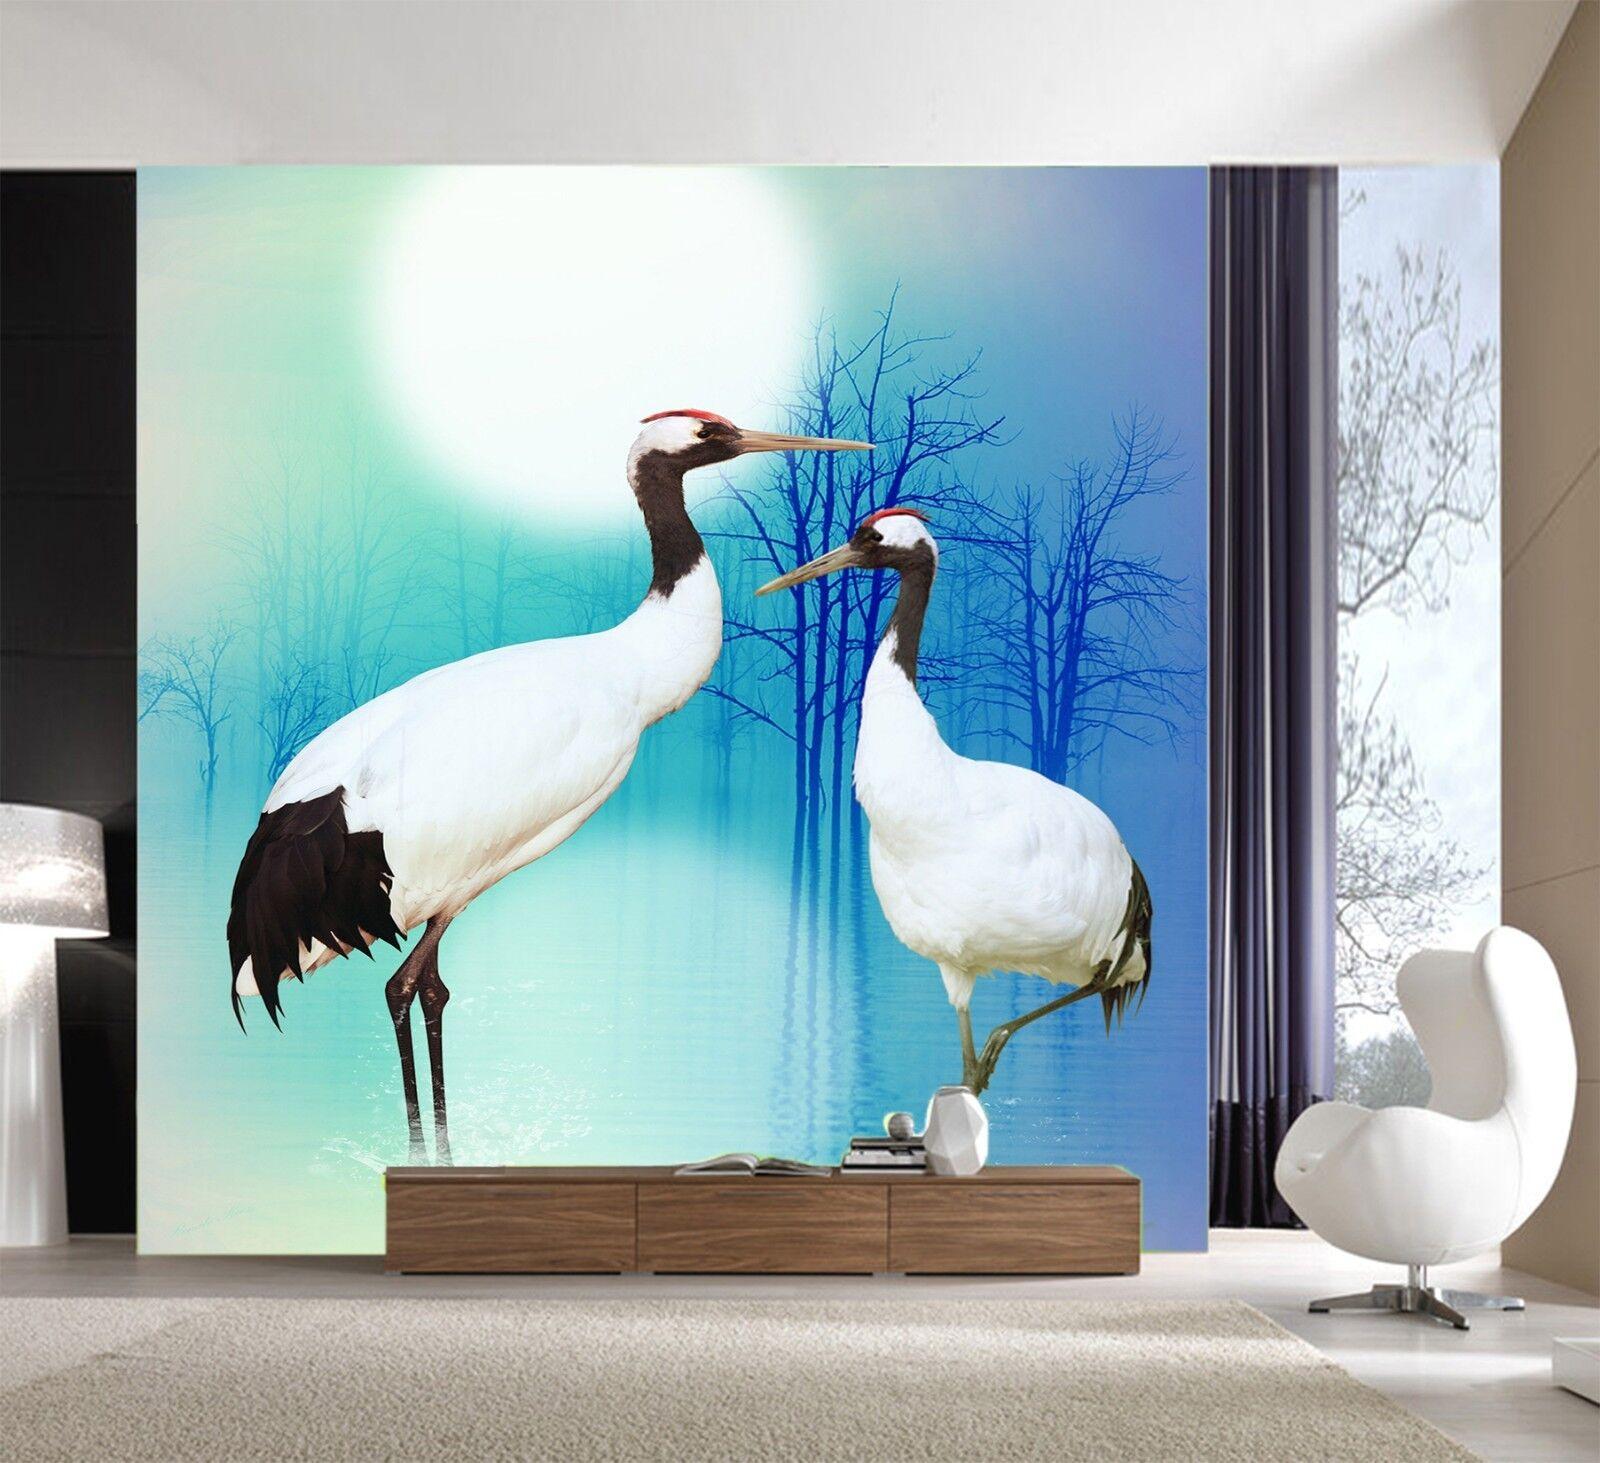 3D Crane Blau 7147 Wallpaper Mural Wall Print Wall Wallpaper Murals US Lemon